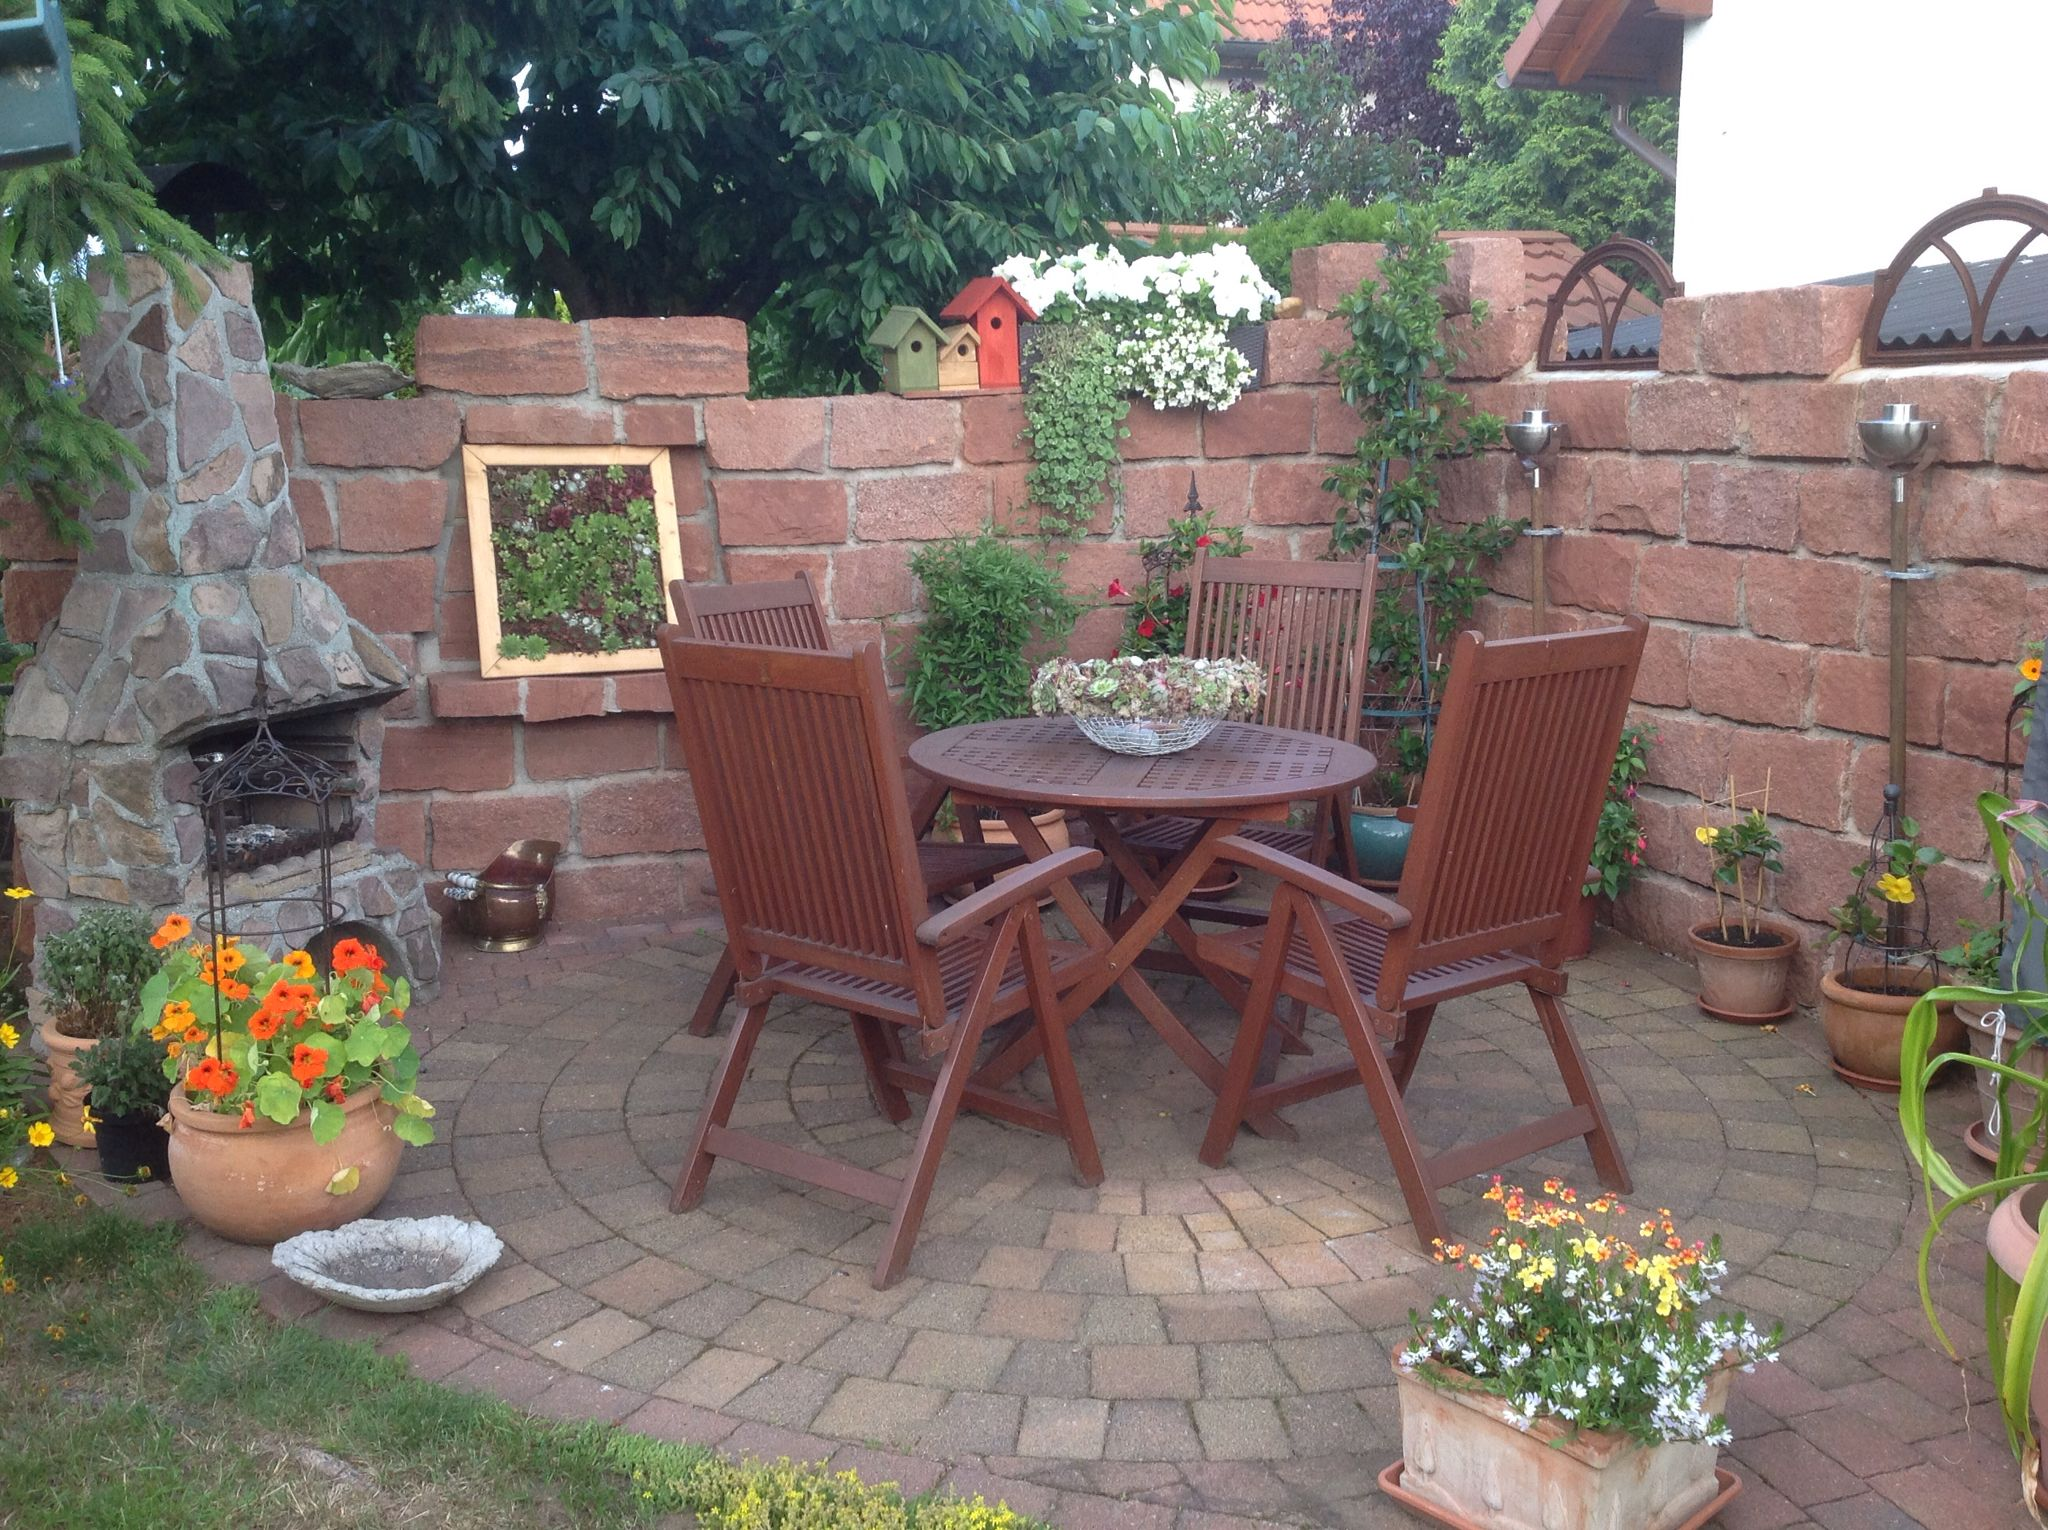 grillecke mit sukkulenten garden pinterest sommer. Black Bedroom Furniture Sets. Home Design Ideas